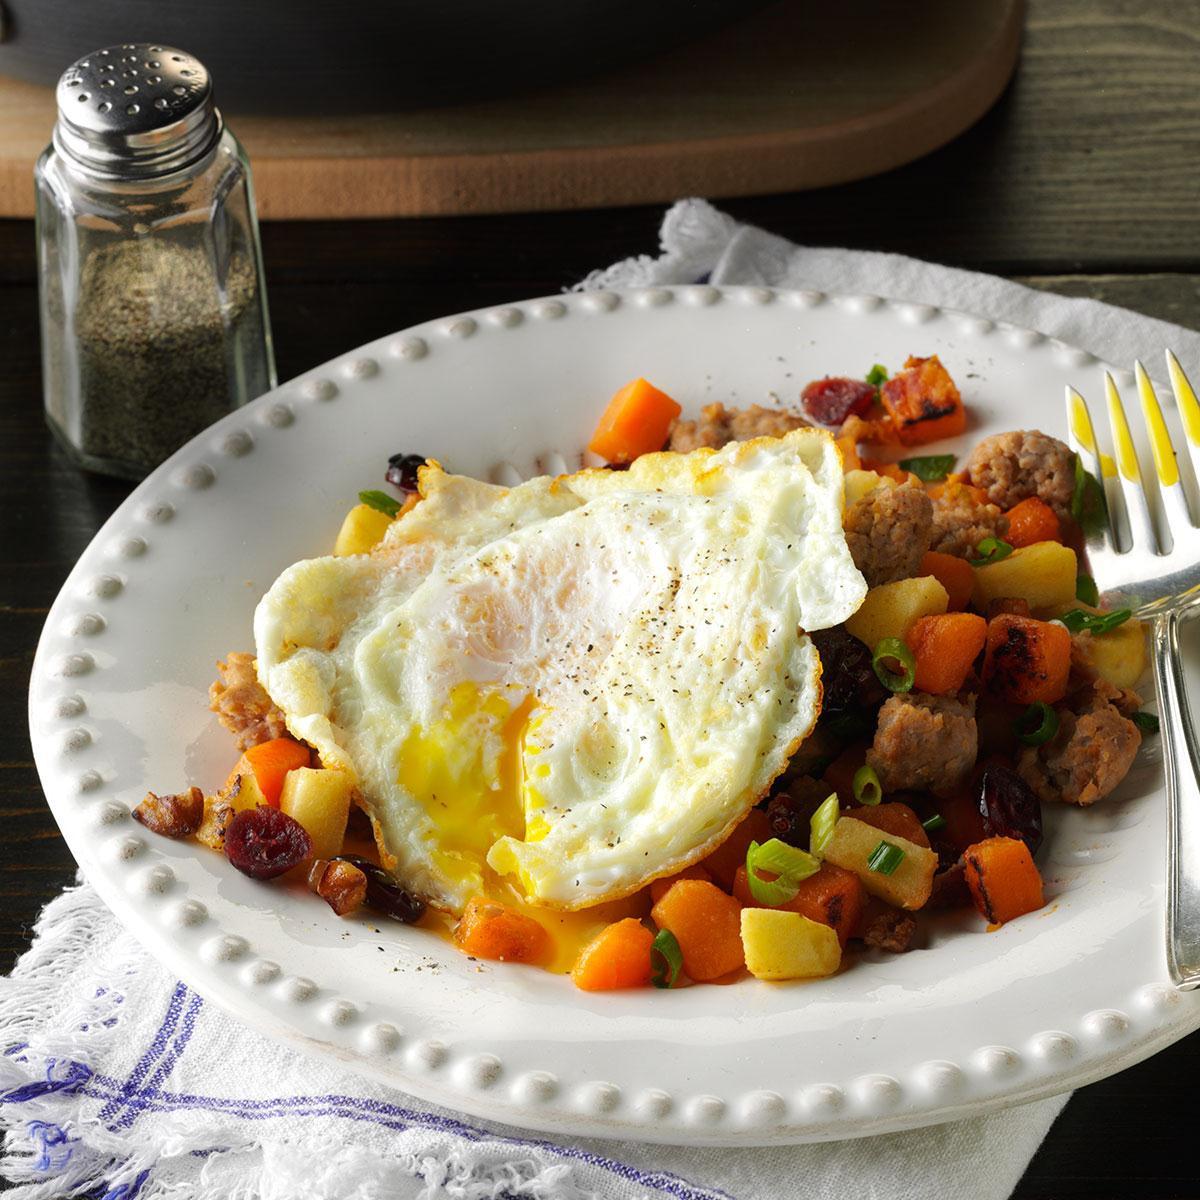 Easy Diabetic Breakfast Recipes  40 Delicious Brunch Recipes for Diabetics